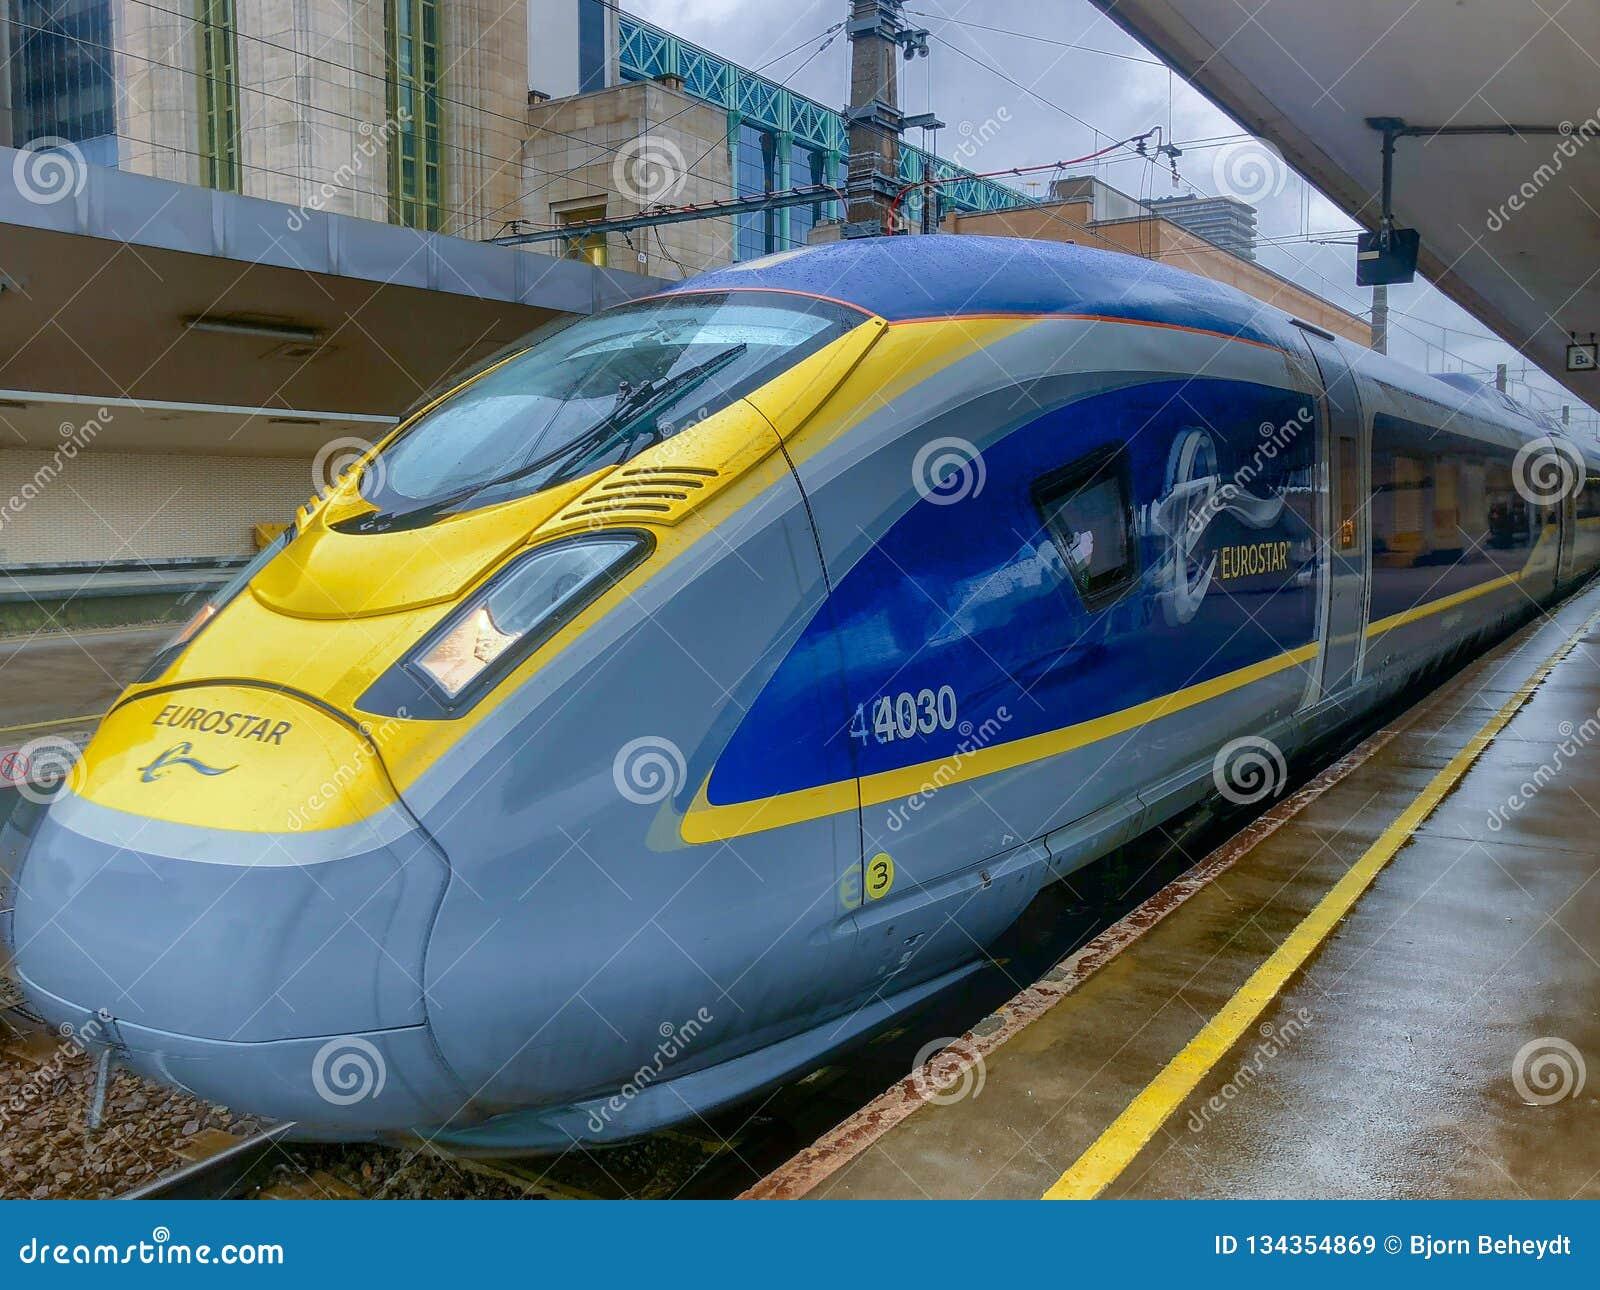 Brussels, Belgium - October 30, 2018: The E320 Eurostar International High Speed passengers Train in the Brussels North railway